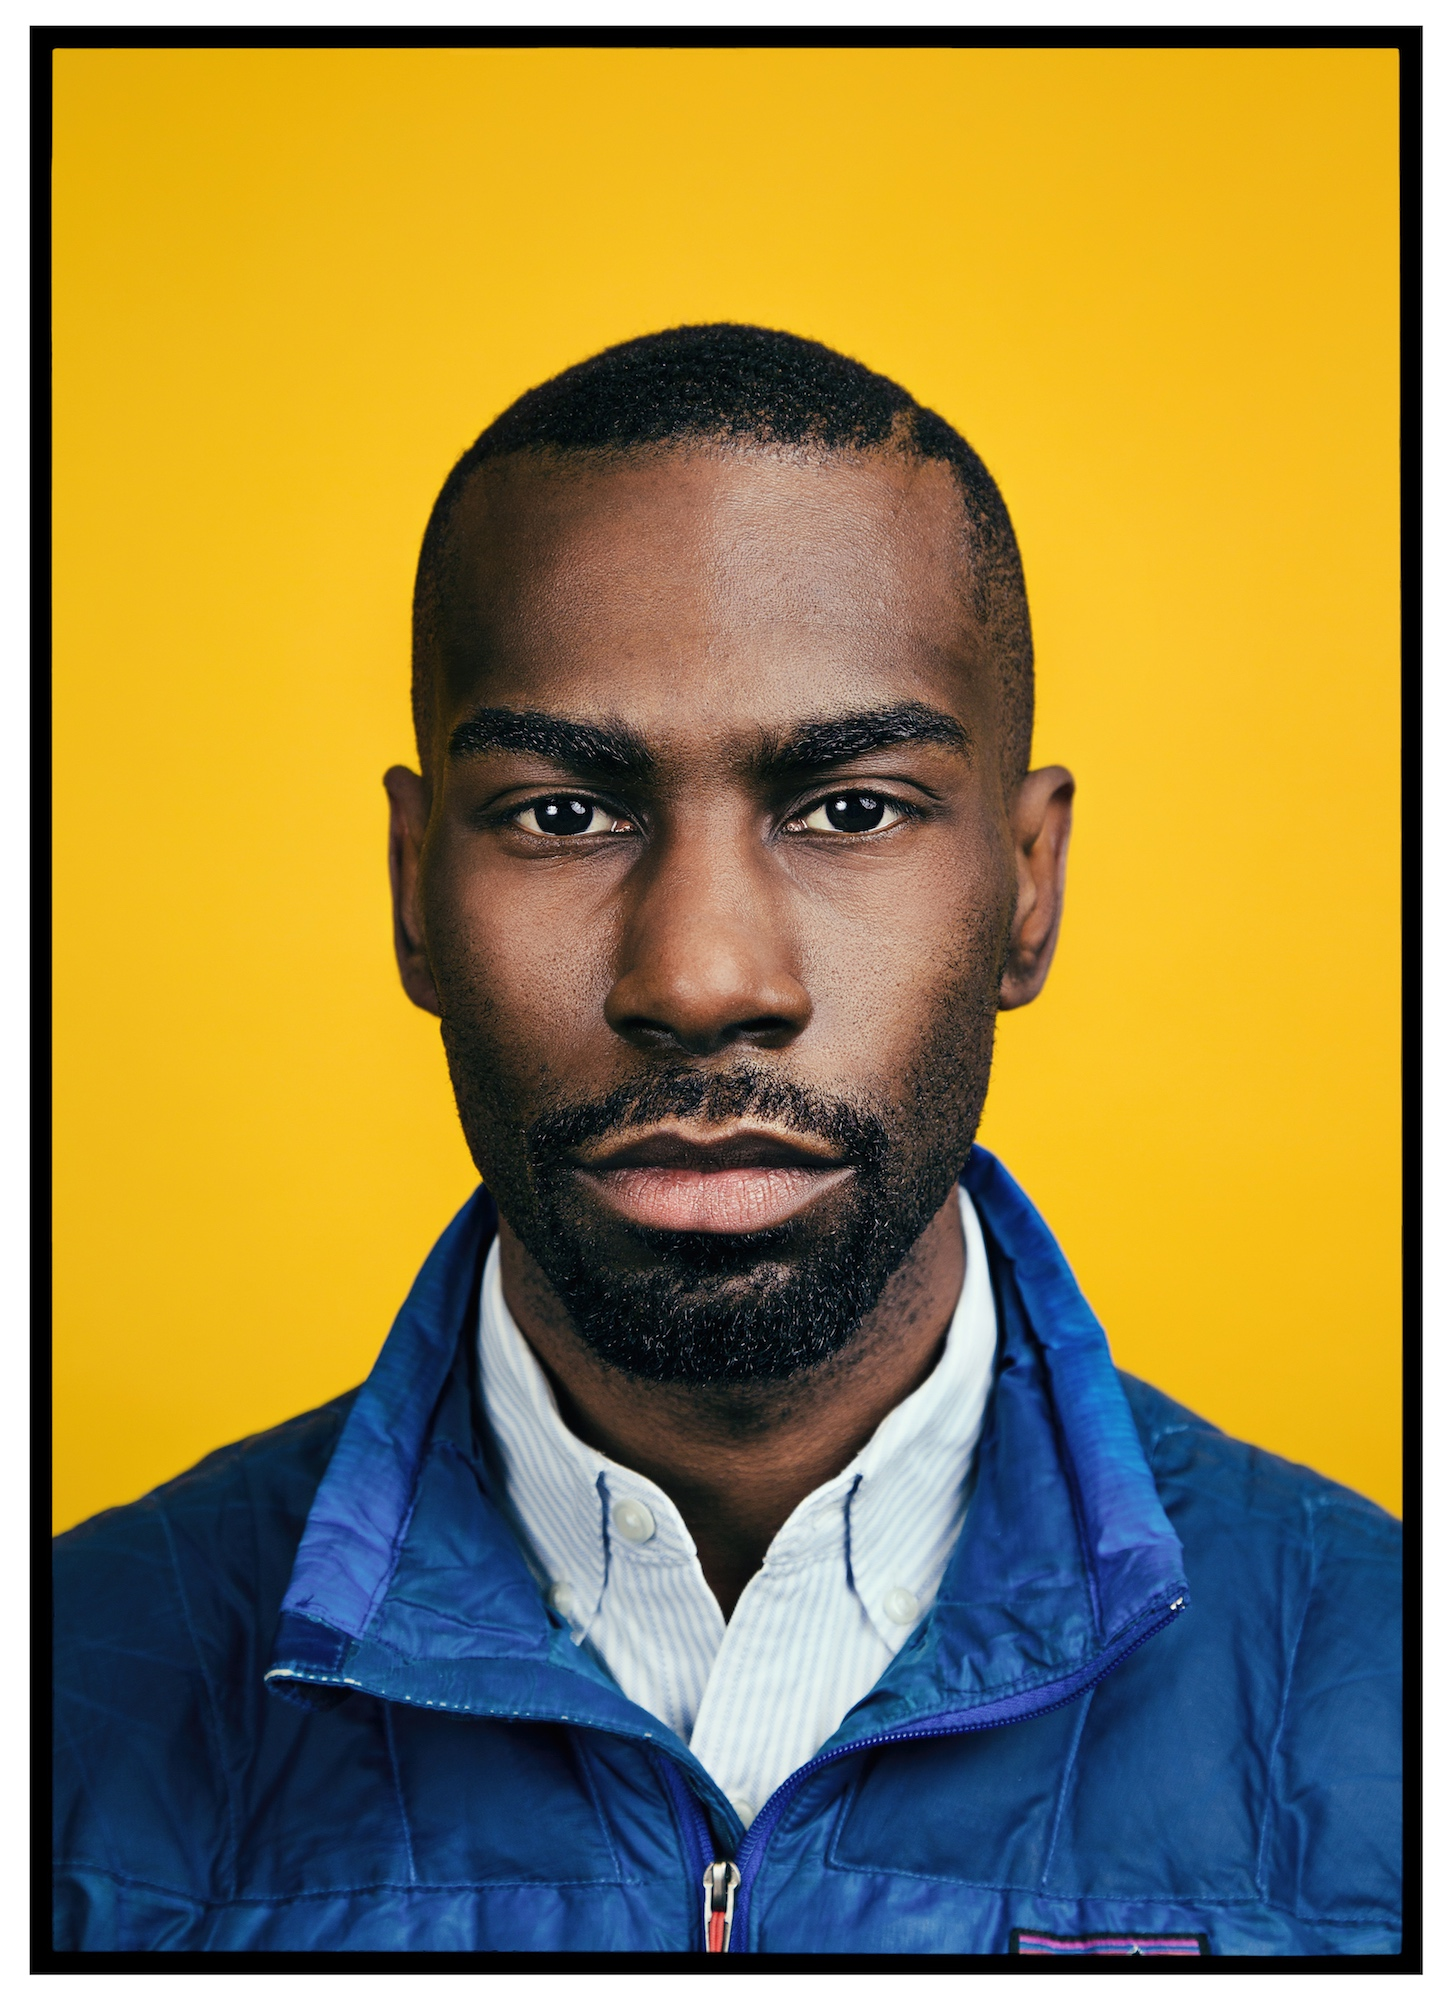 deray mckesson, deray pod save the people, deray activist, deray black lives matter, black lives matter, pod save the people, quinn russell brown